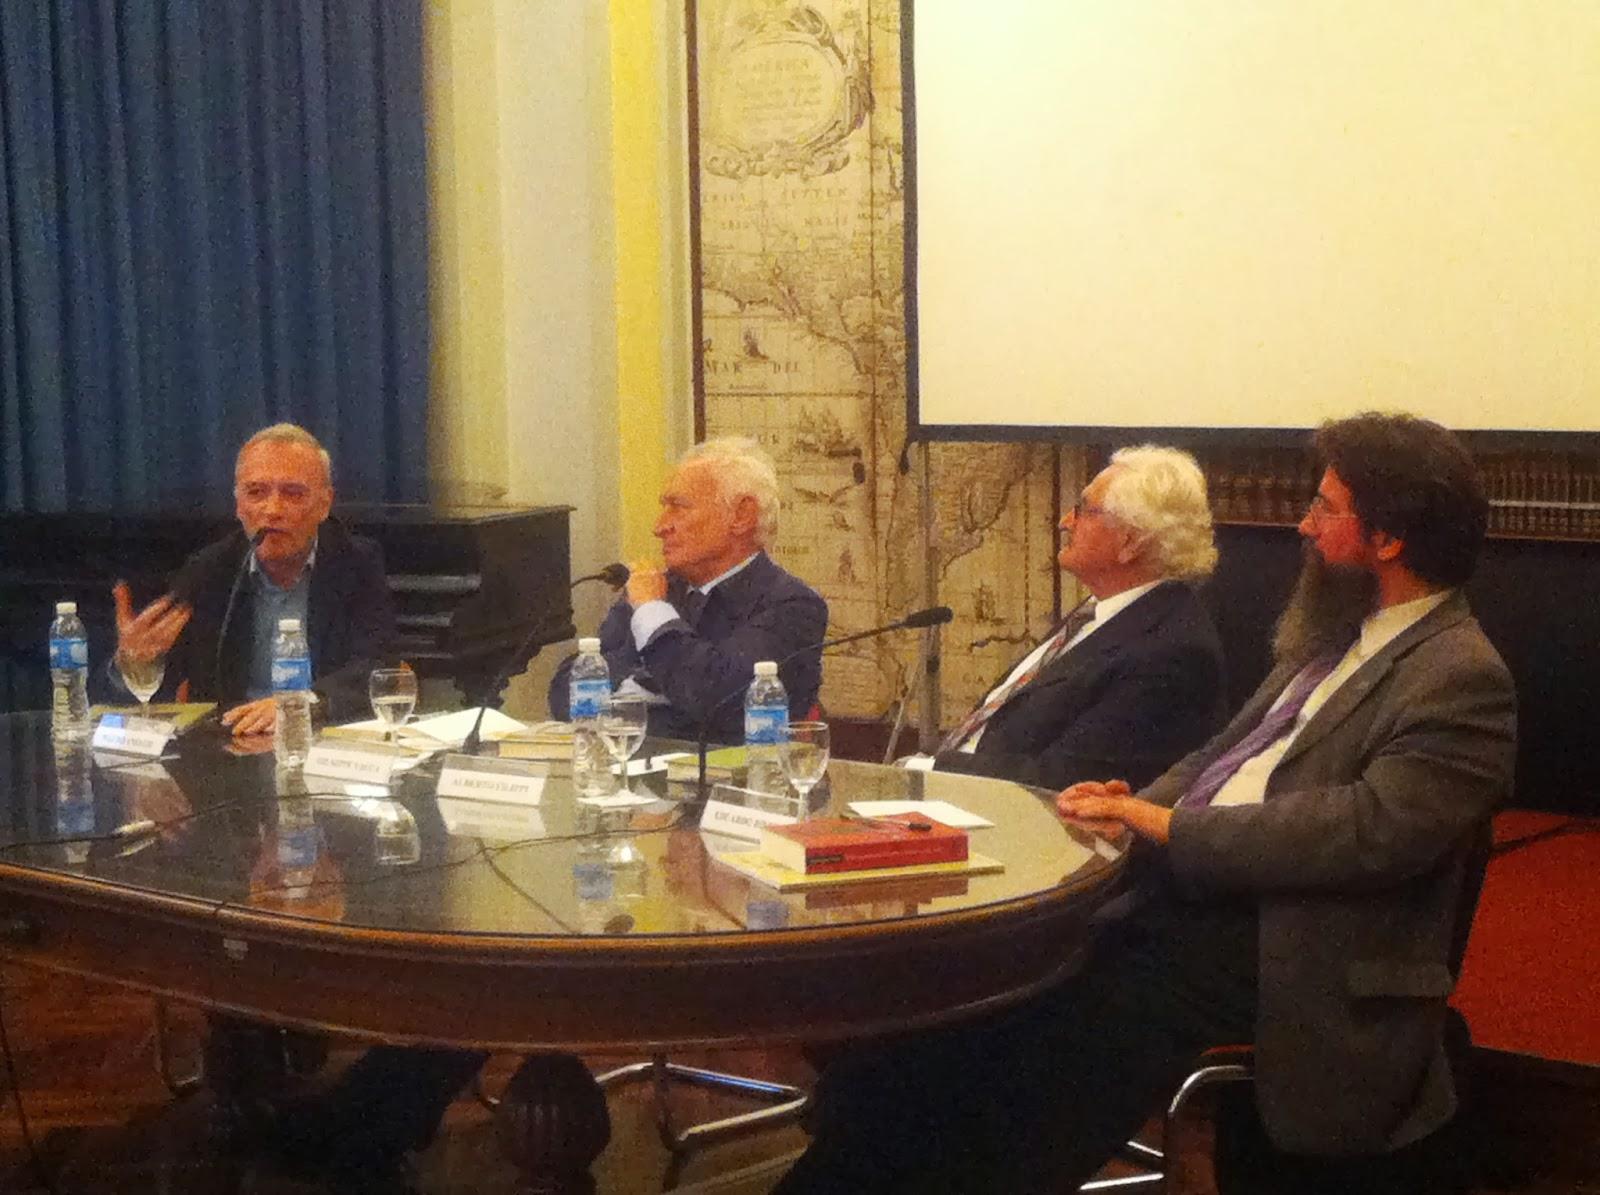 Diarios de un principito gramsci en argentina for Istituto italiano